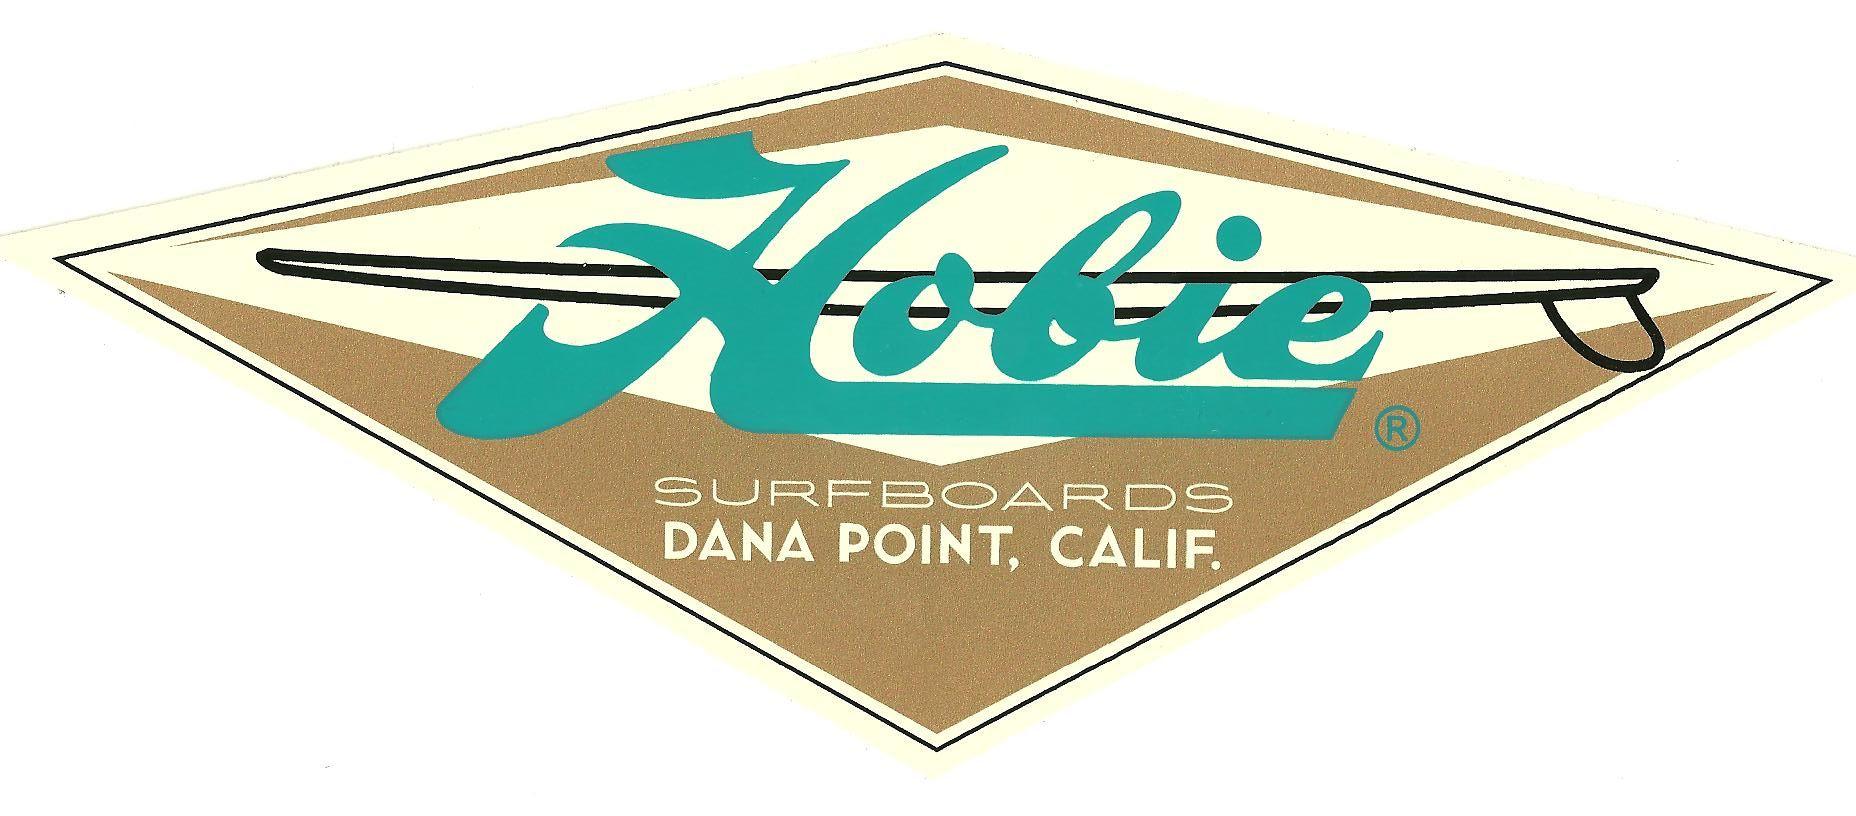 hobie logo - Google Search | Great Surf Logos & Art | Surf